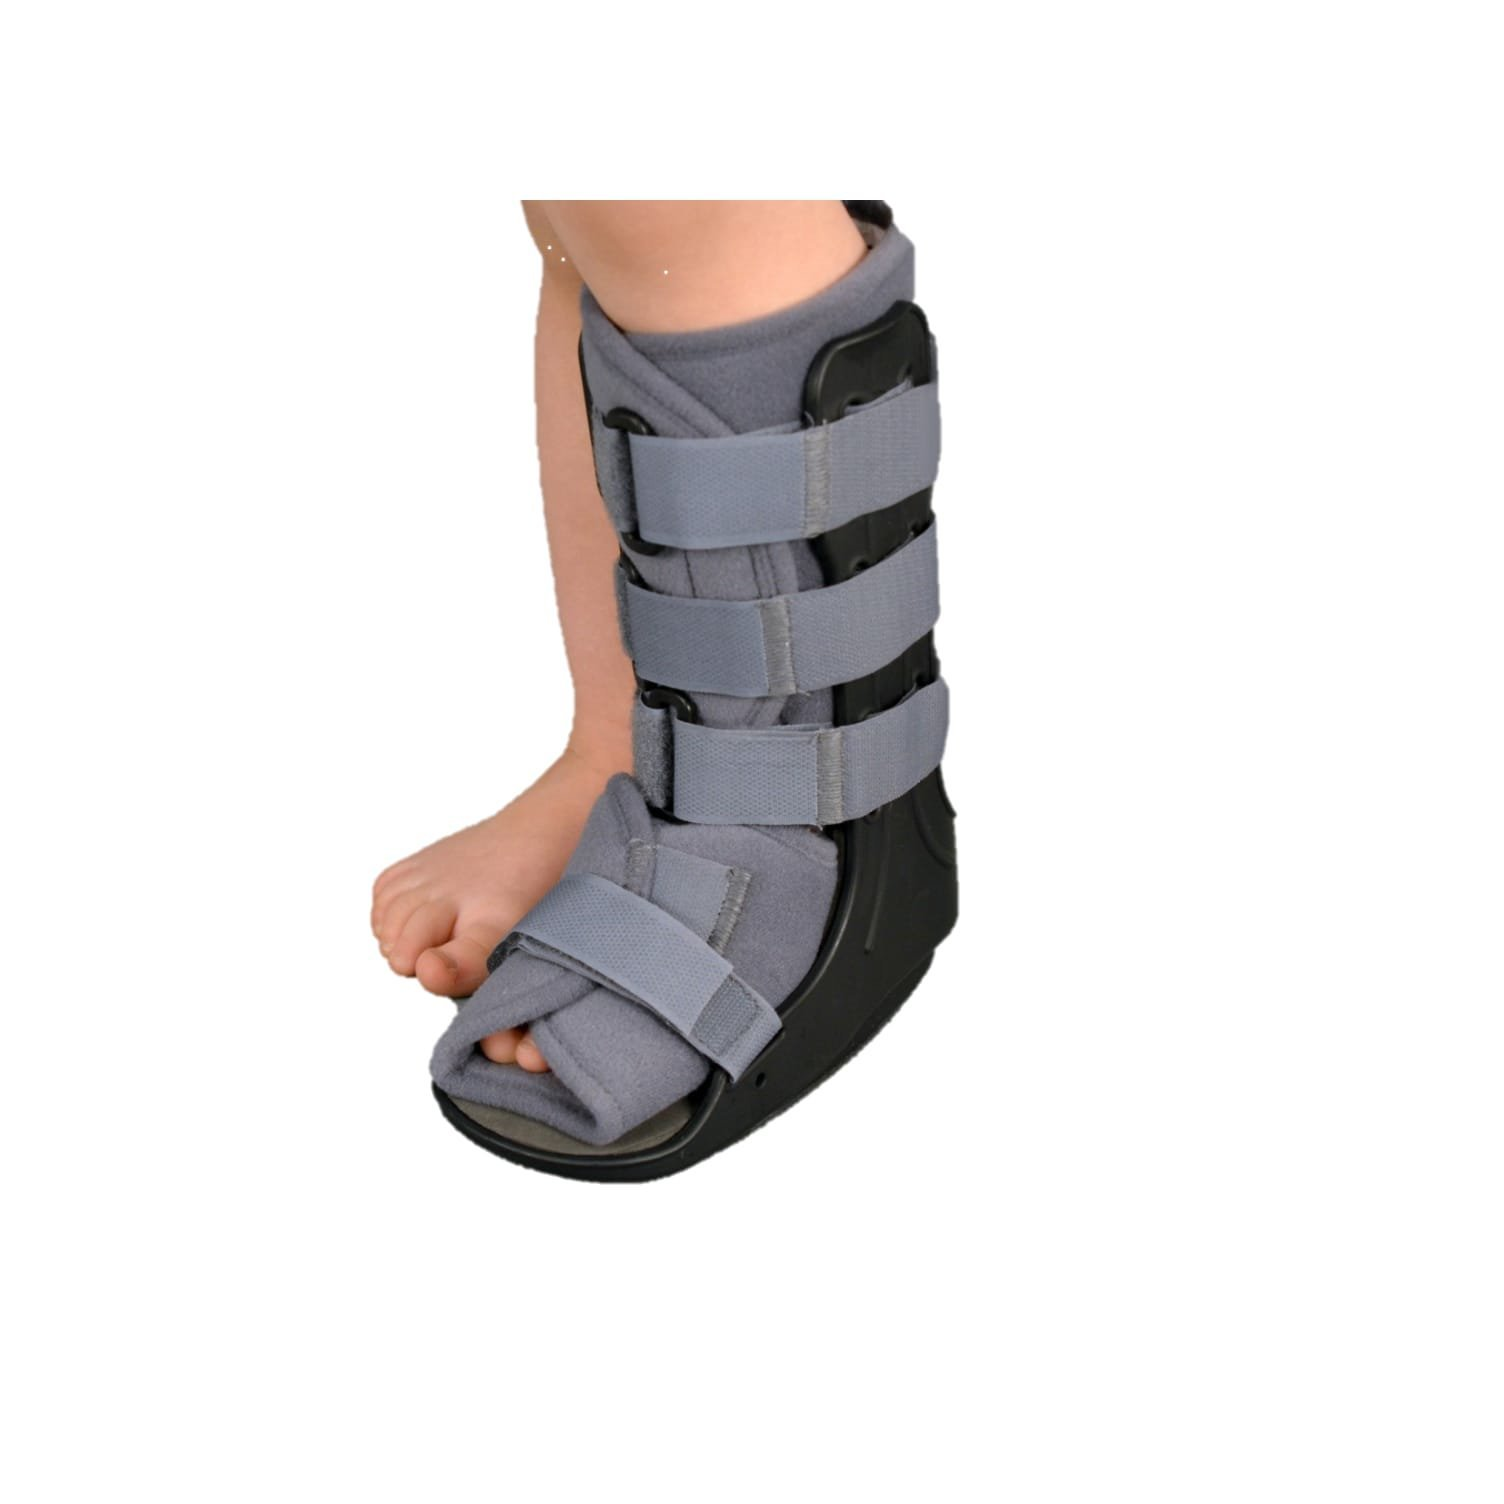 Mars Wellness Premium Pediatric Cam Walker Fracture Ankle Boot - L